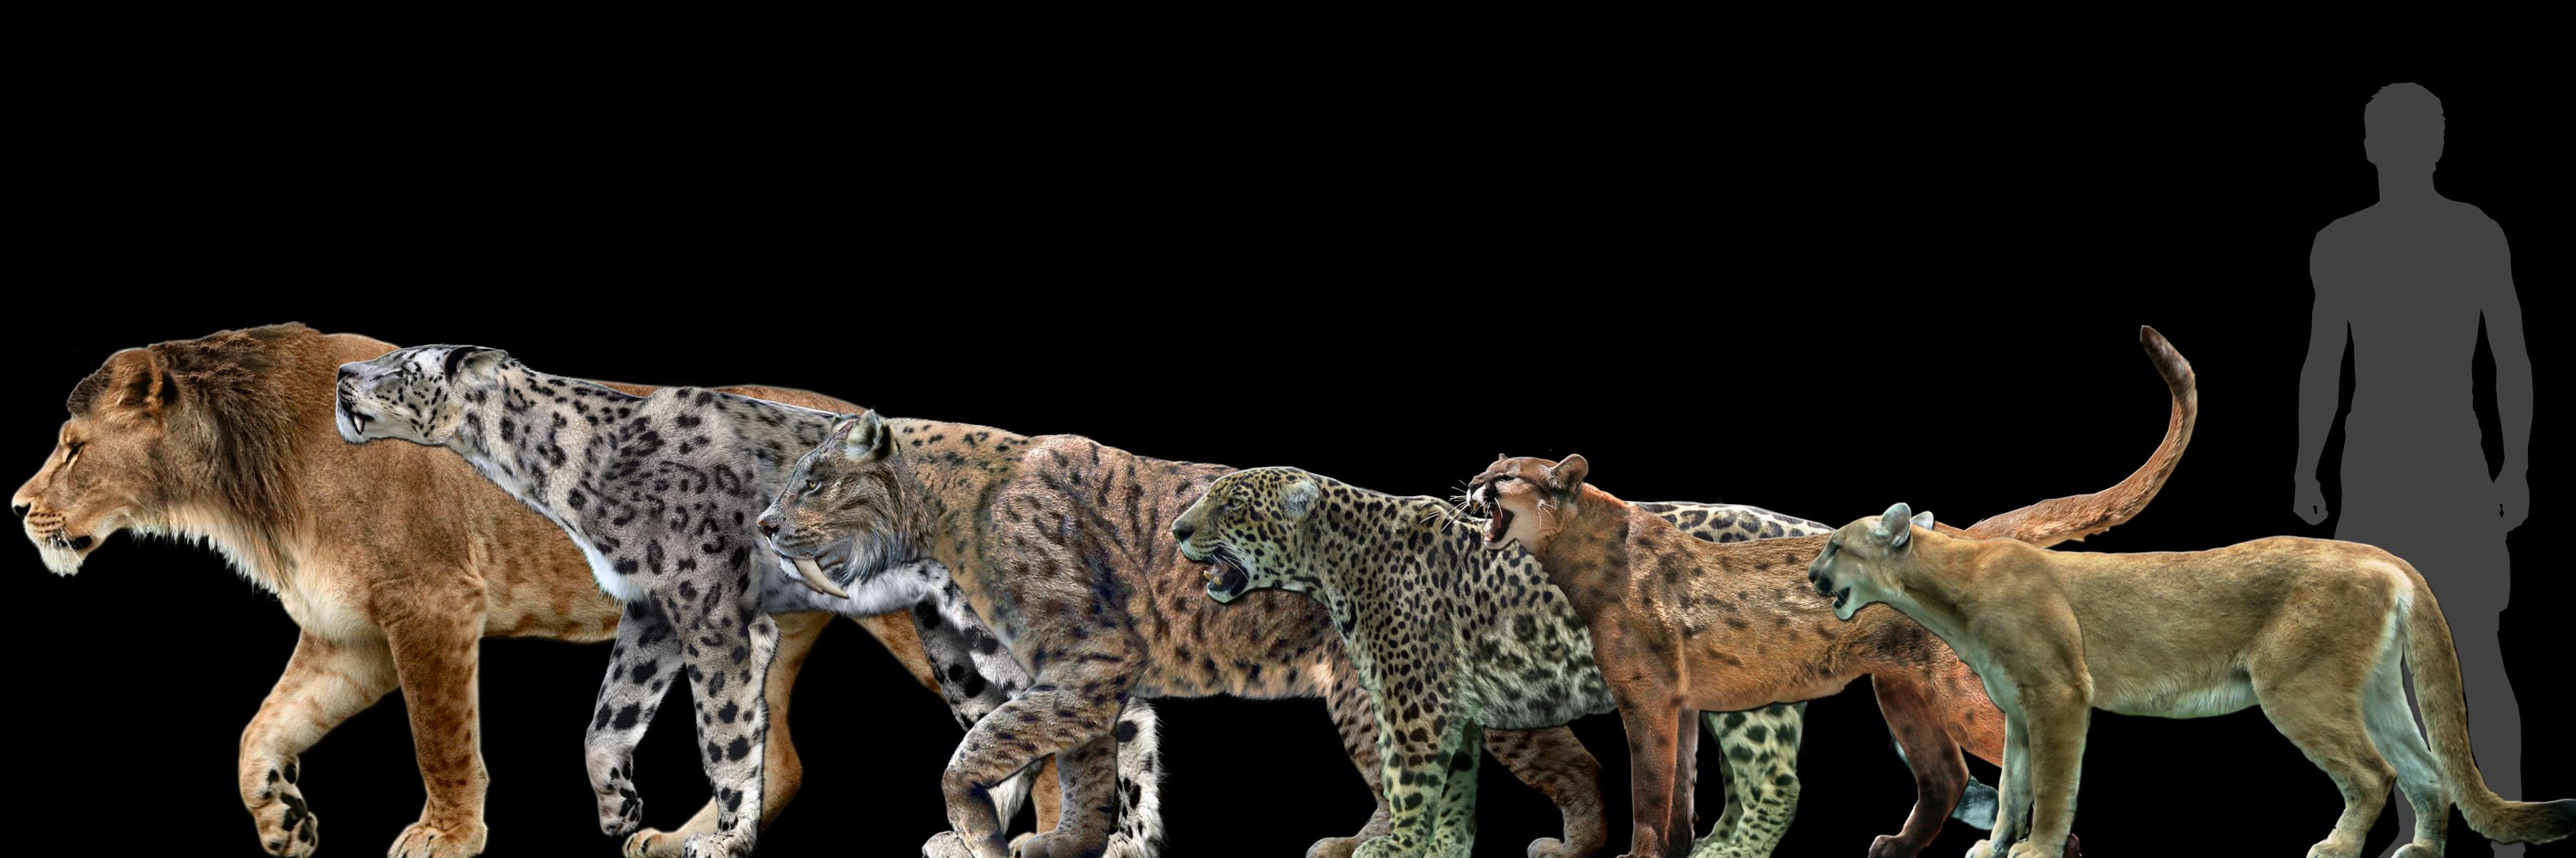 [Image: Big_cats____into_big_poster__by_Dantheman9758.jpg]